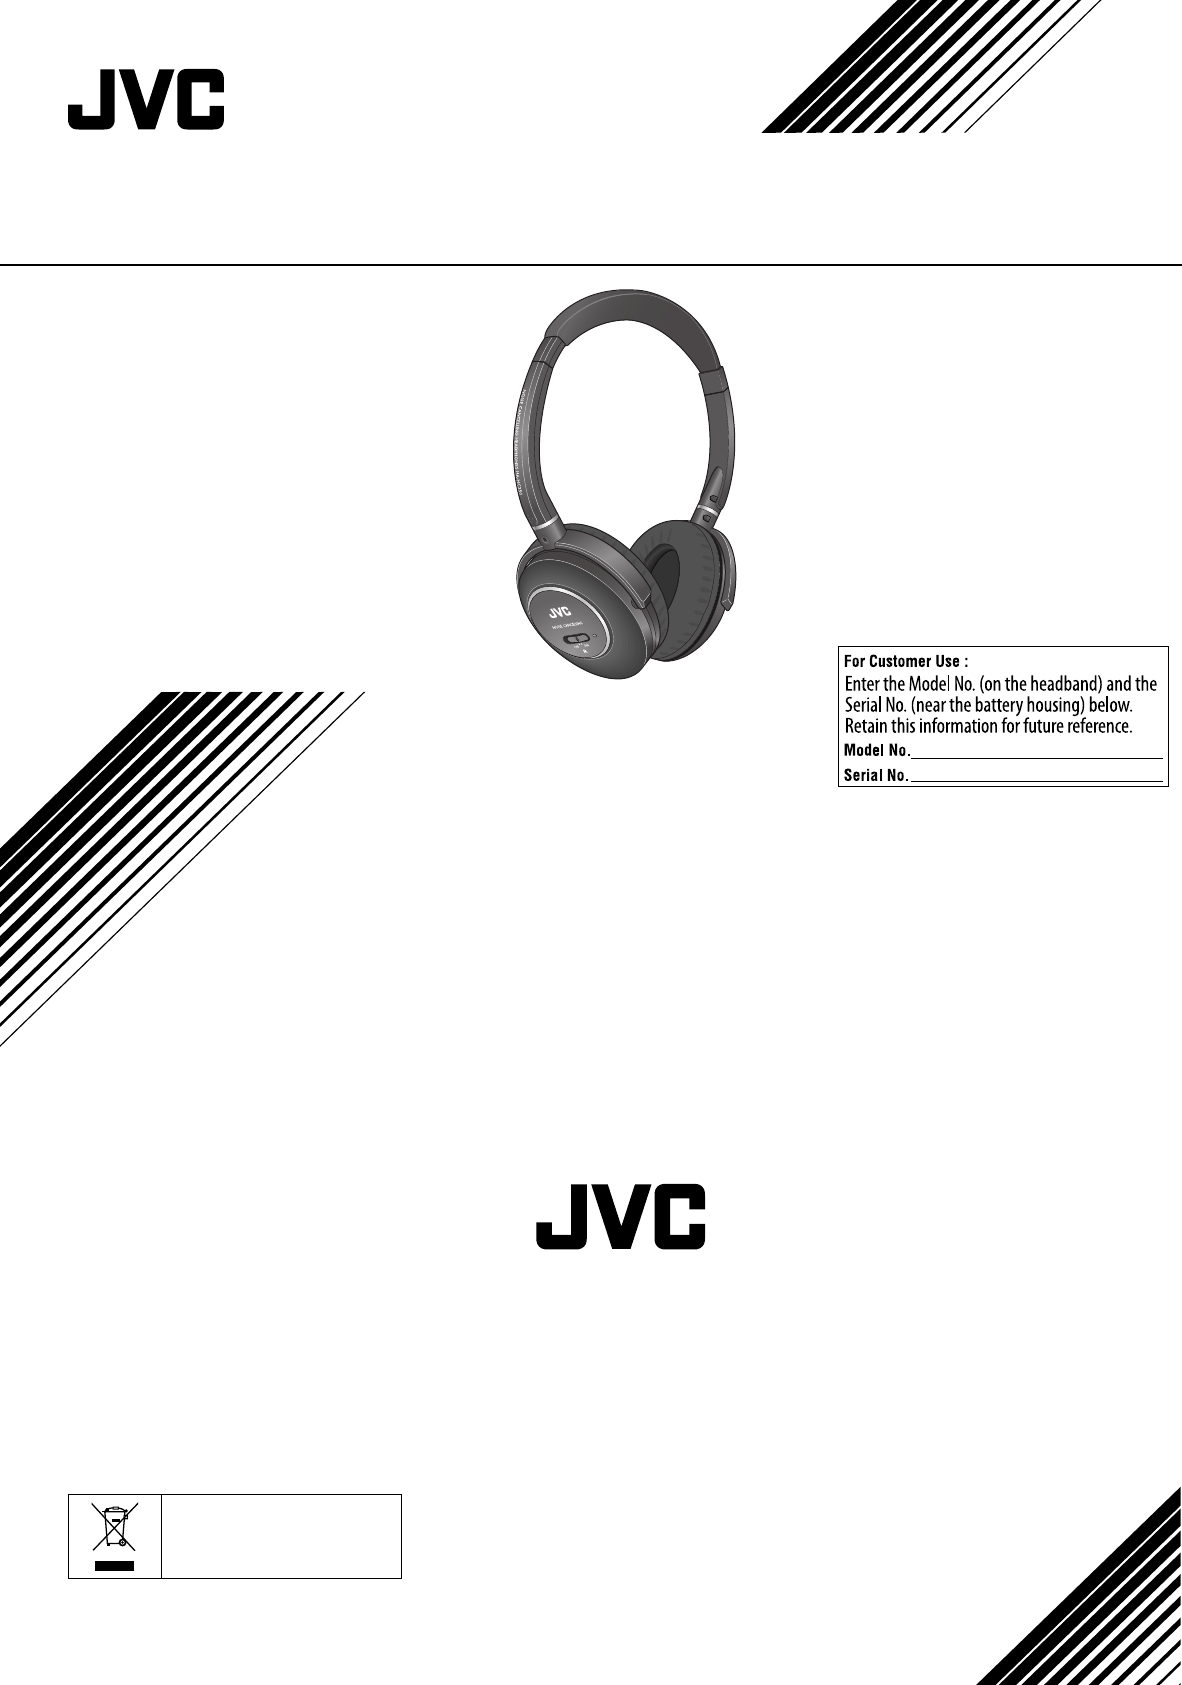 Jvc Noise Canceling Headphones Hanc250 Users Manual HA